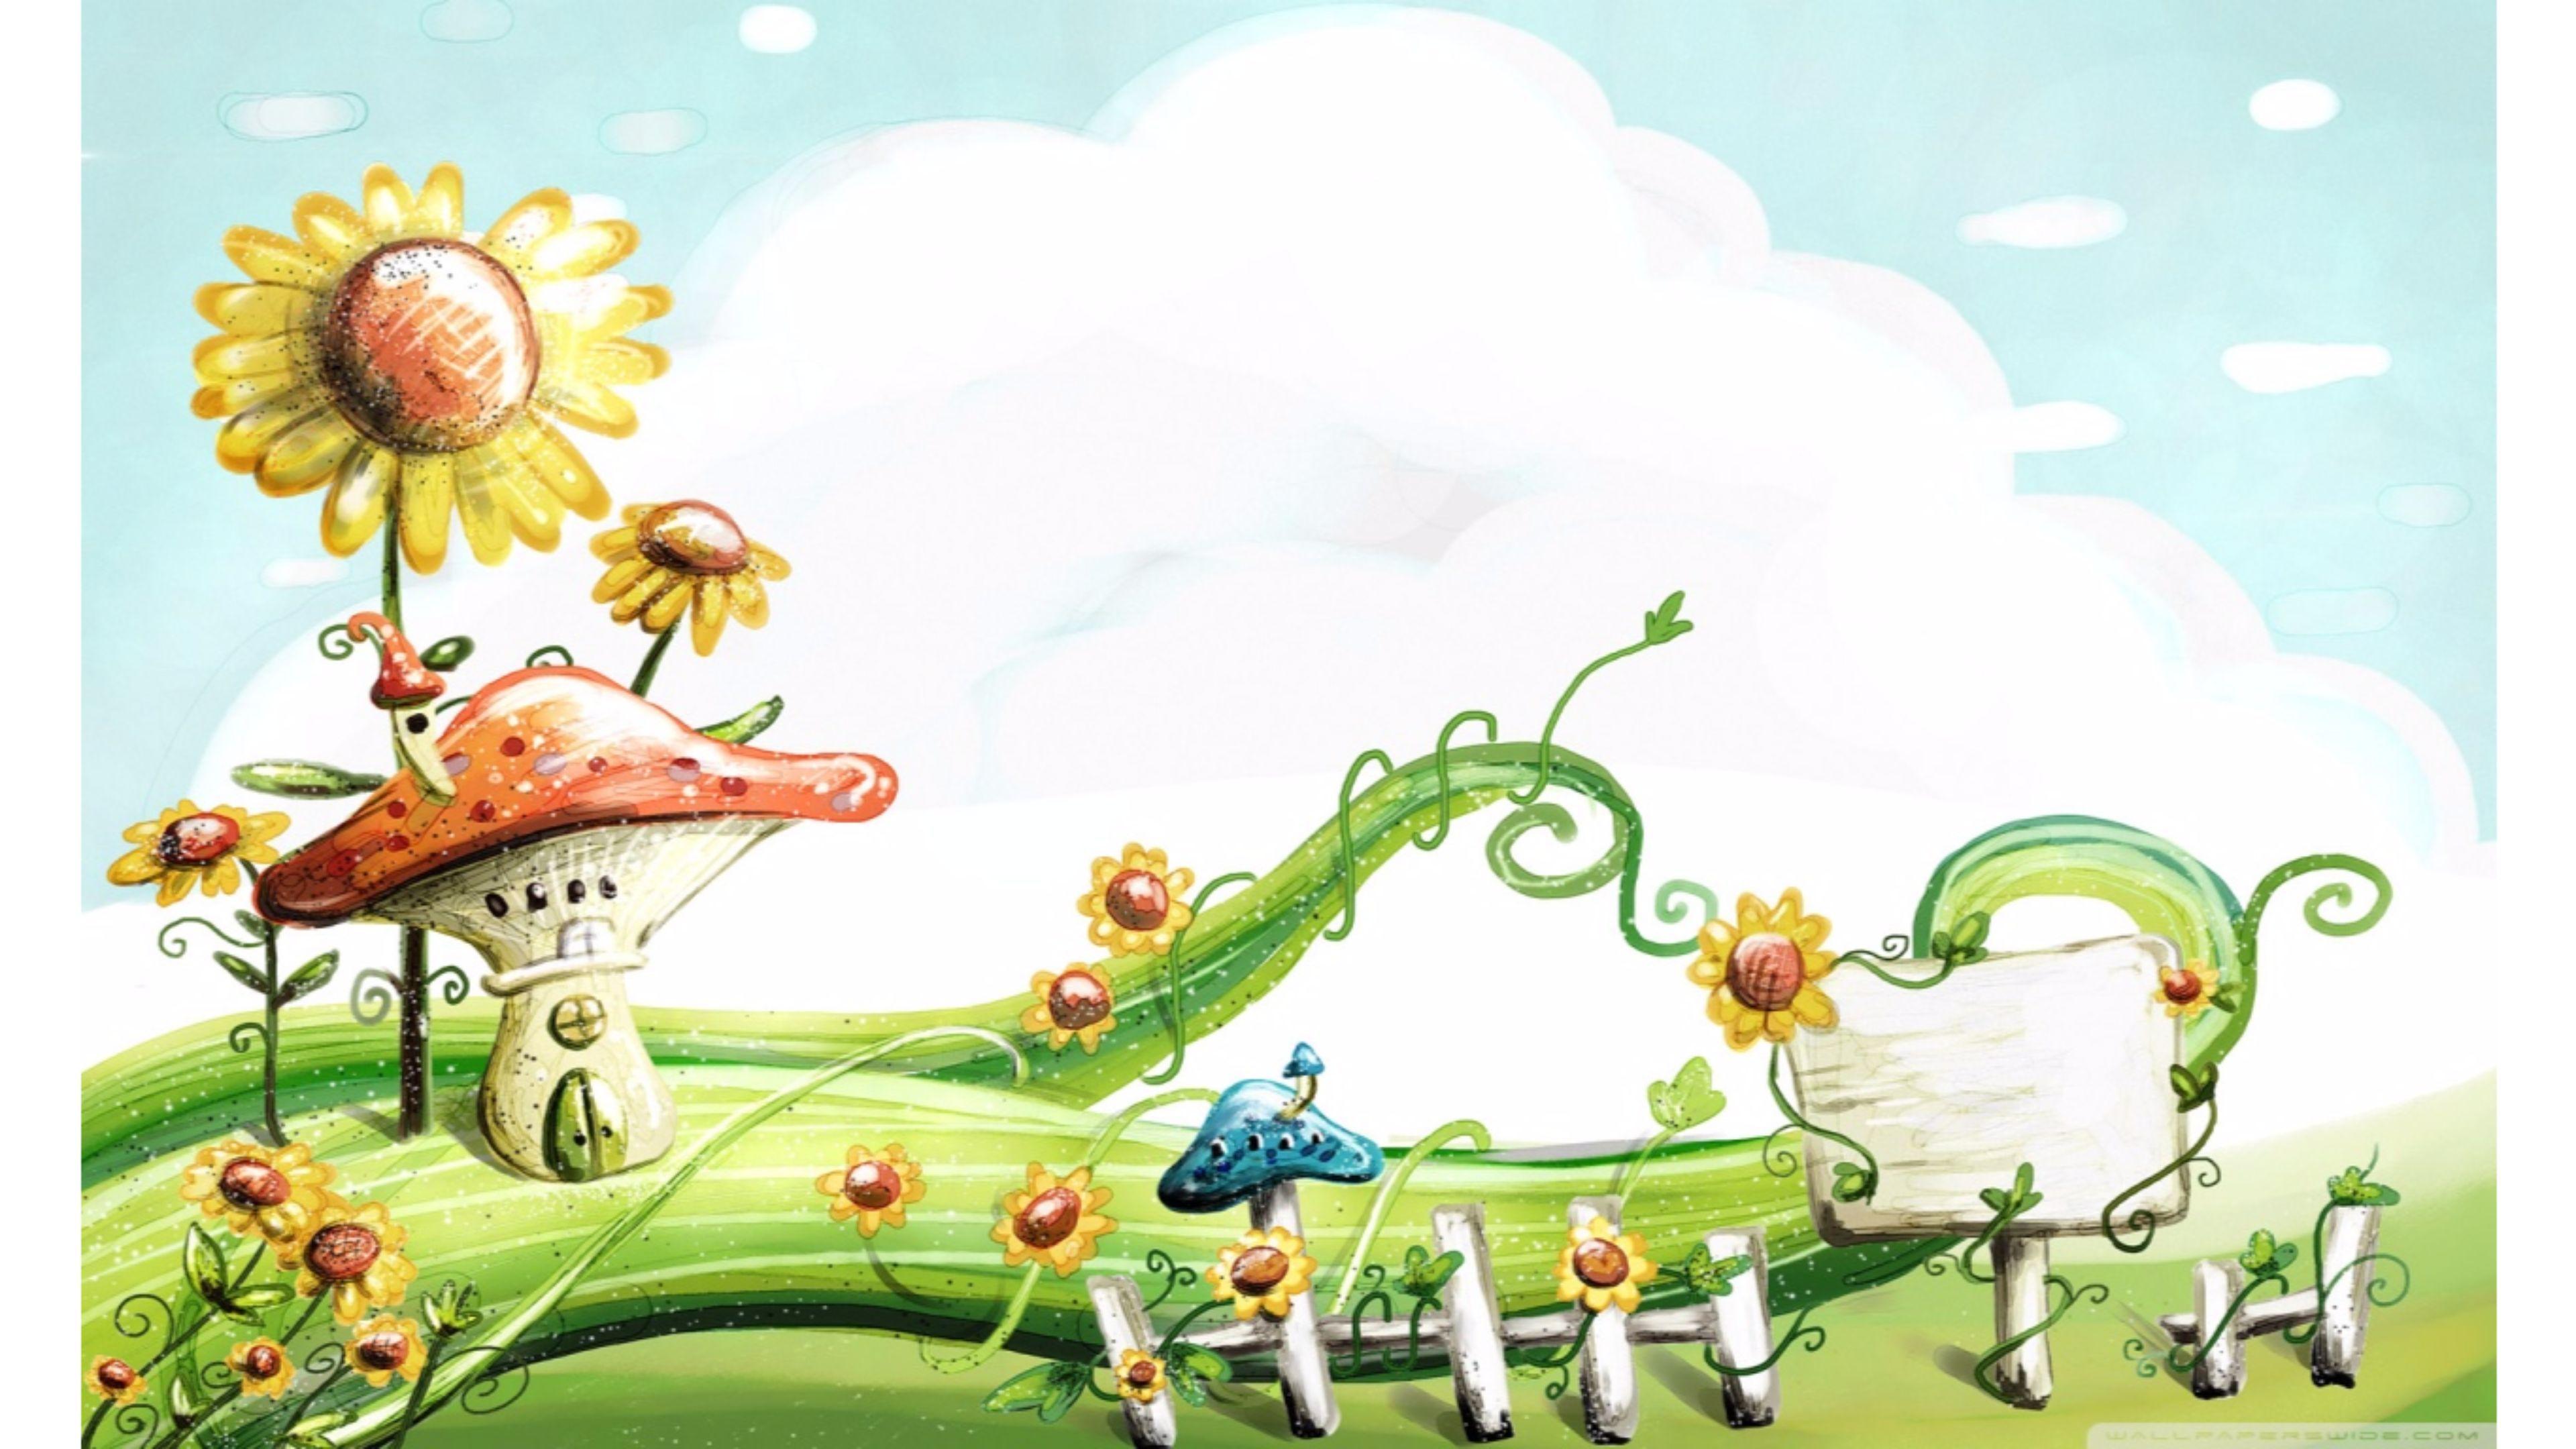 Kids Summer 4k Wallpaper Free 4k Wallpaper Eikones